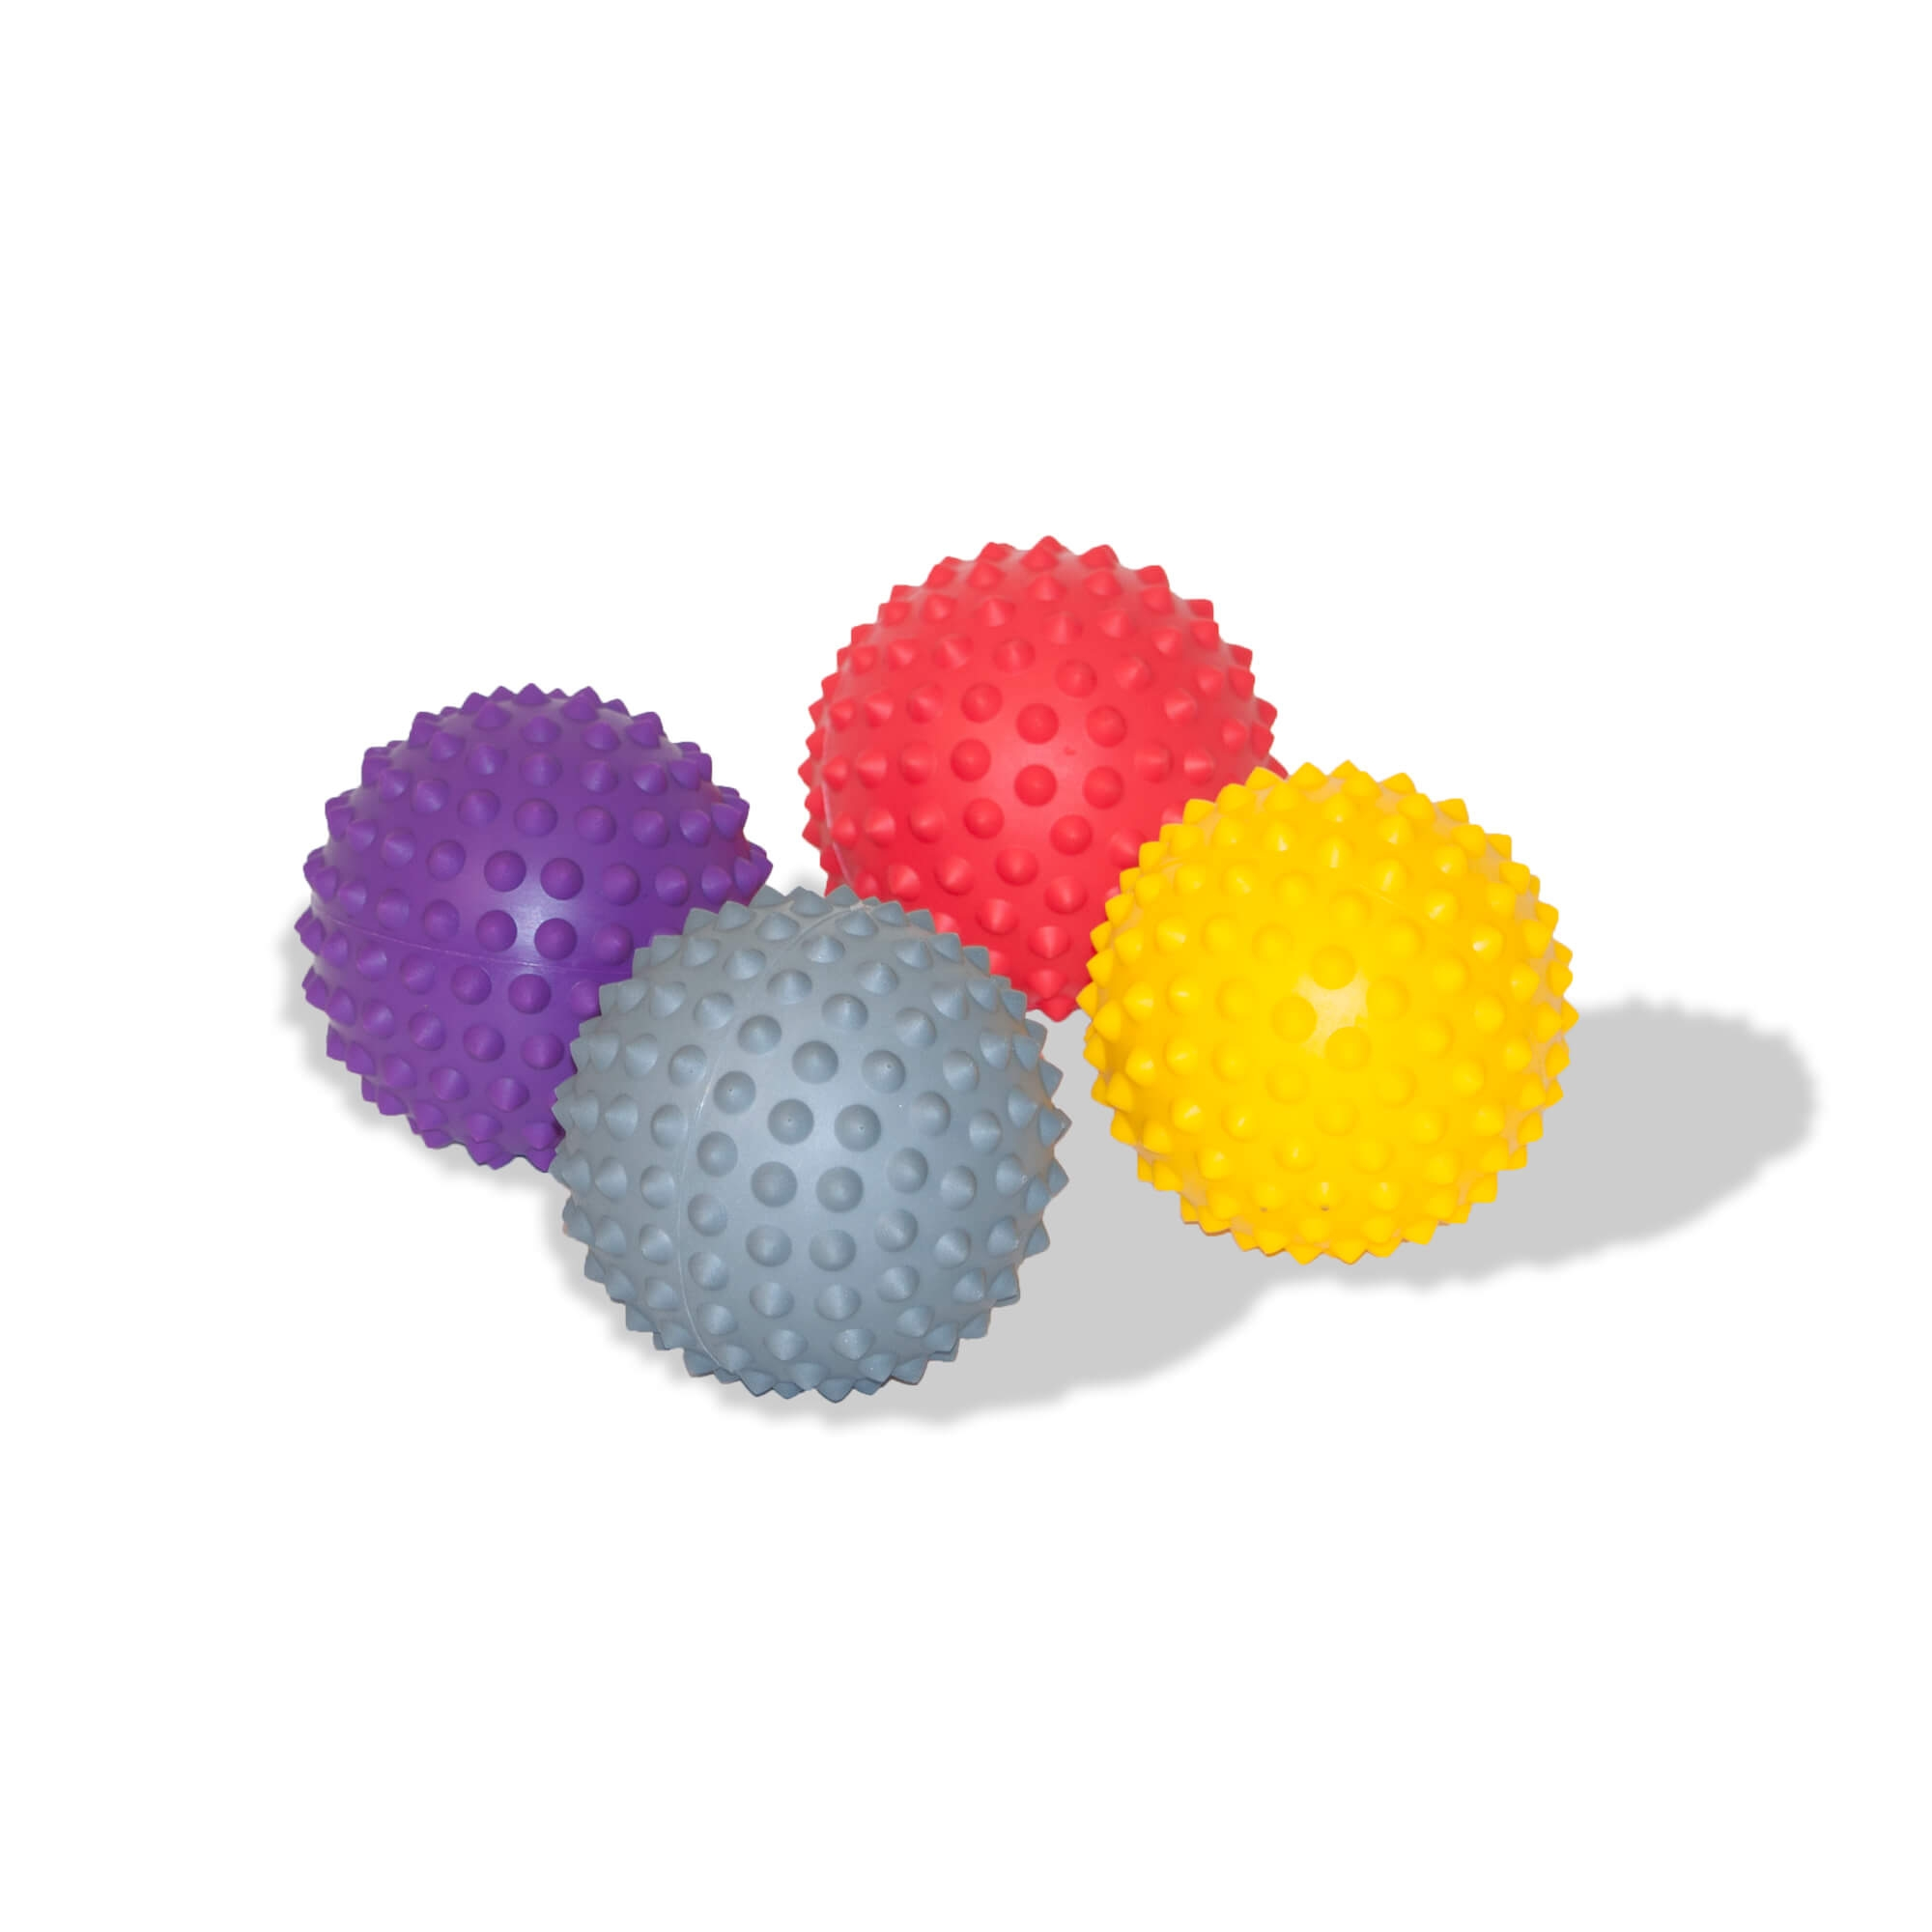 Prickle Stimulating Balls Physical Company Ltd